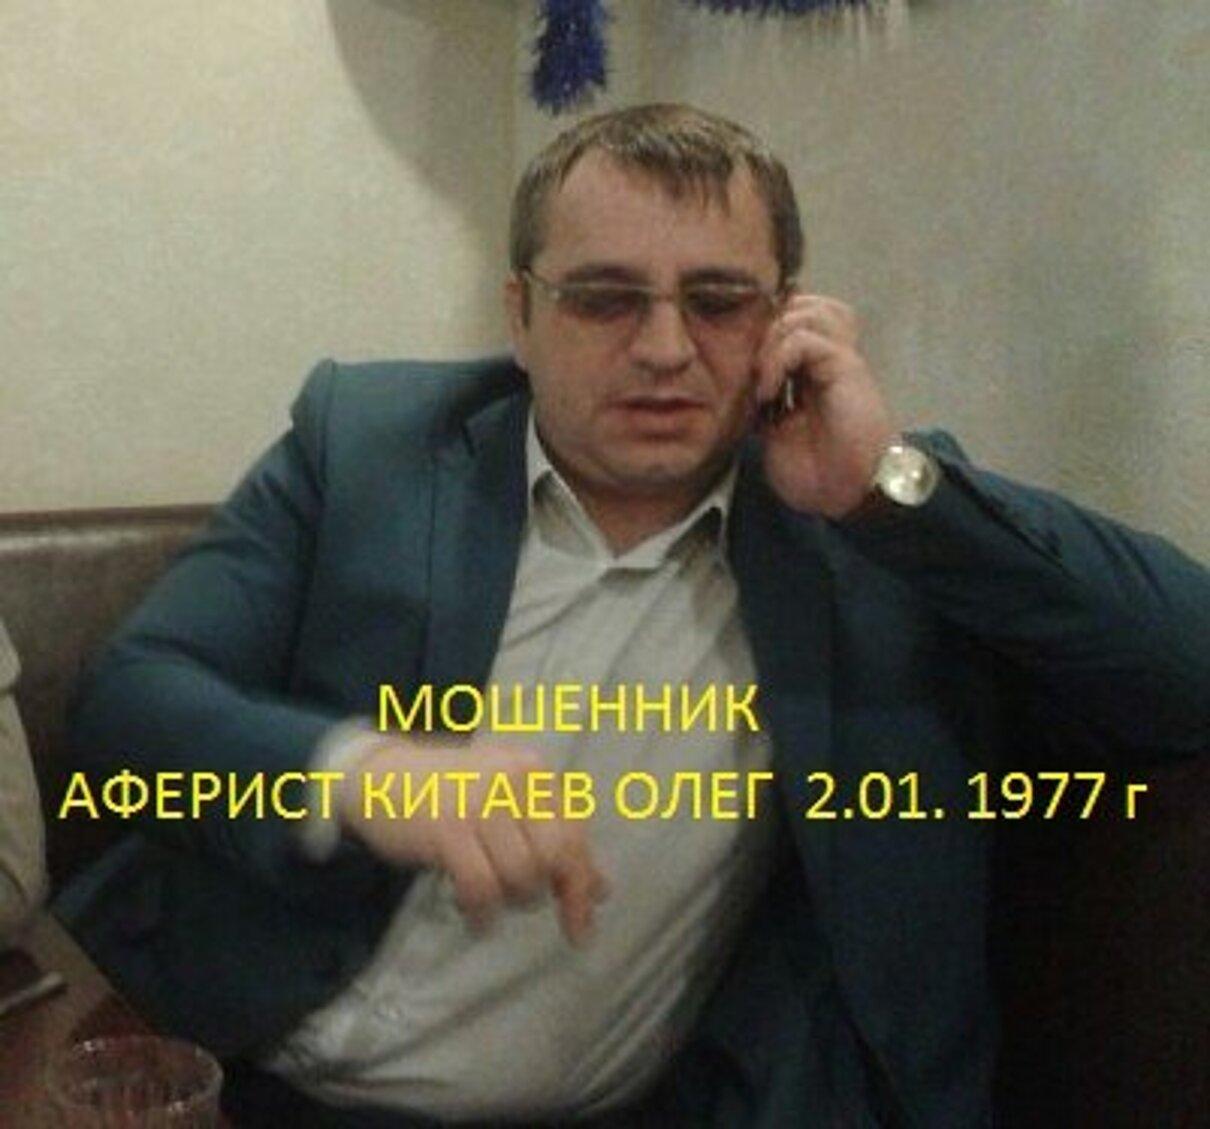 Жалоба-отзыв: Китаев Олег Николаевич - Мошенник аферист.  Фото №1